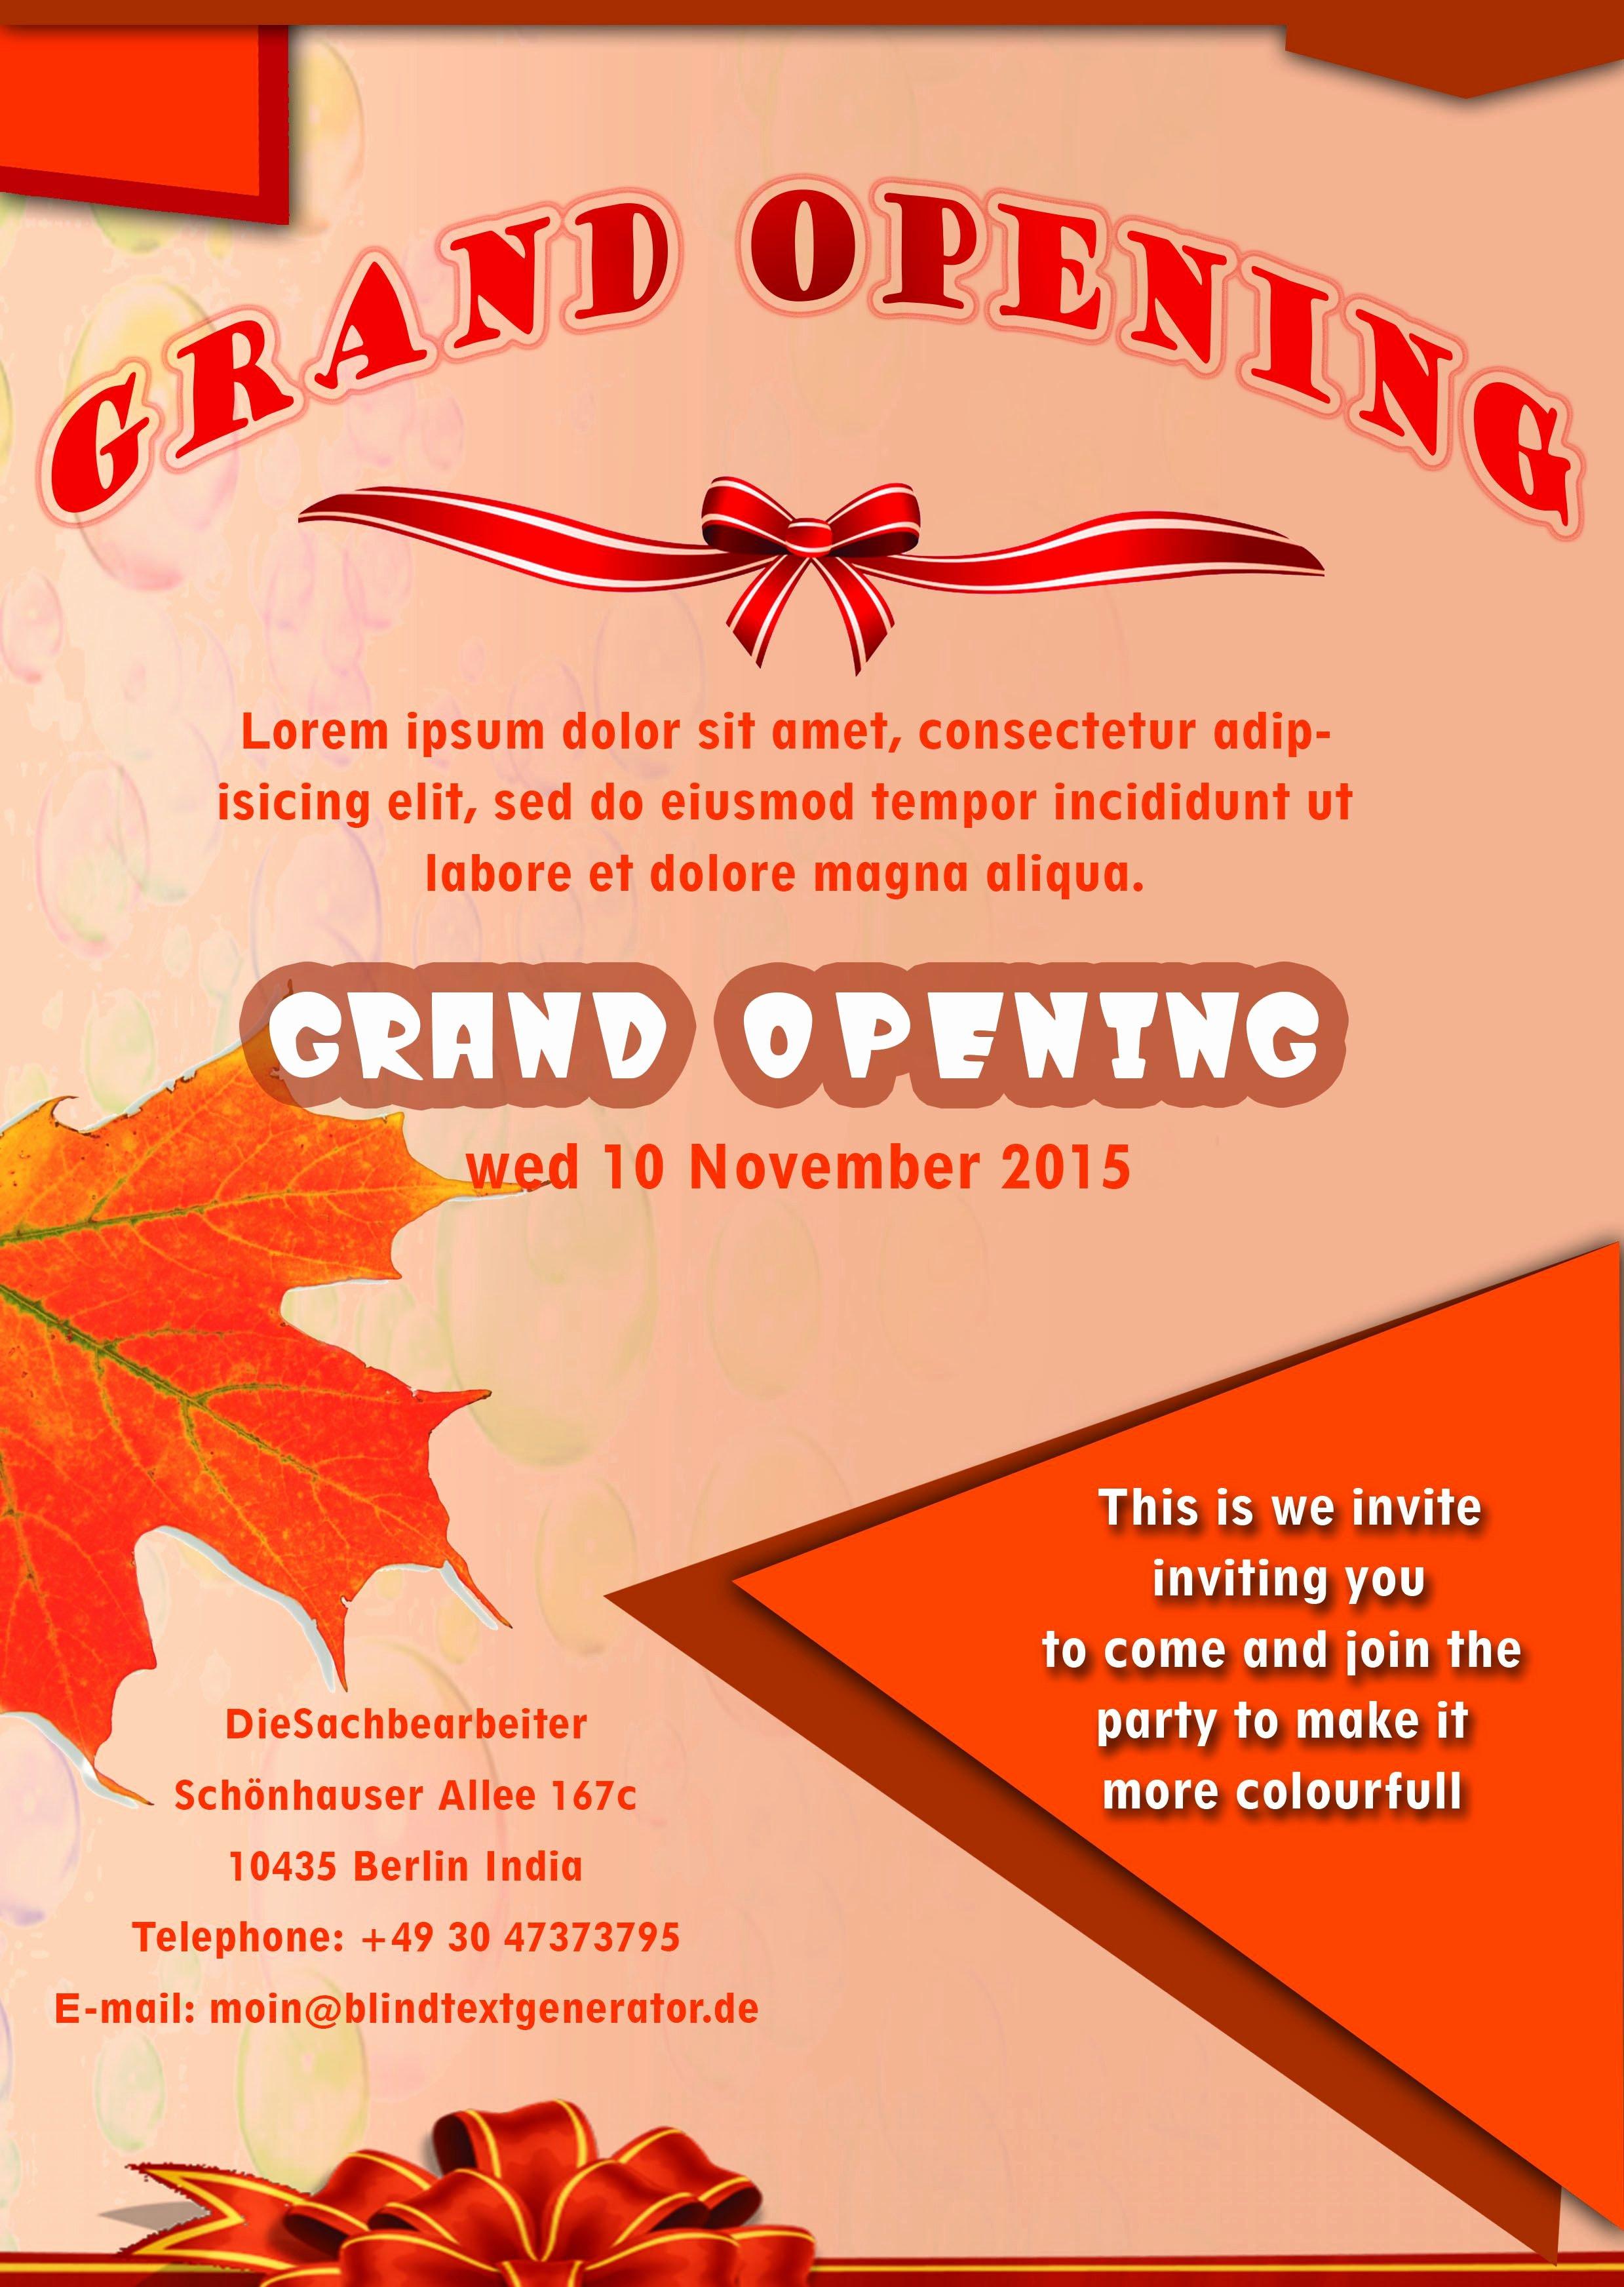 Grand Opening Flyer Template Free Elegant 20 Grand Opening Flyer Templates Free Demplates